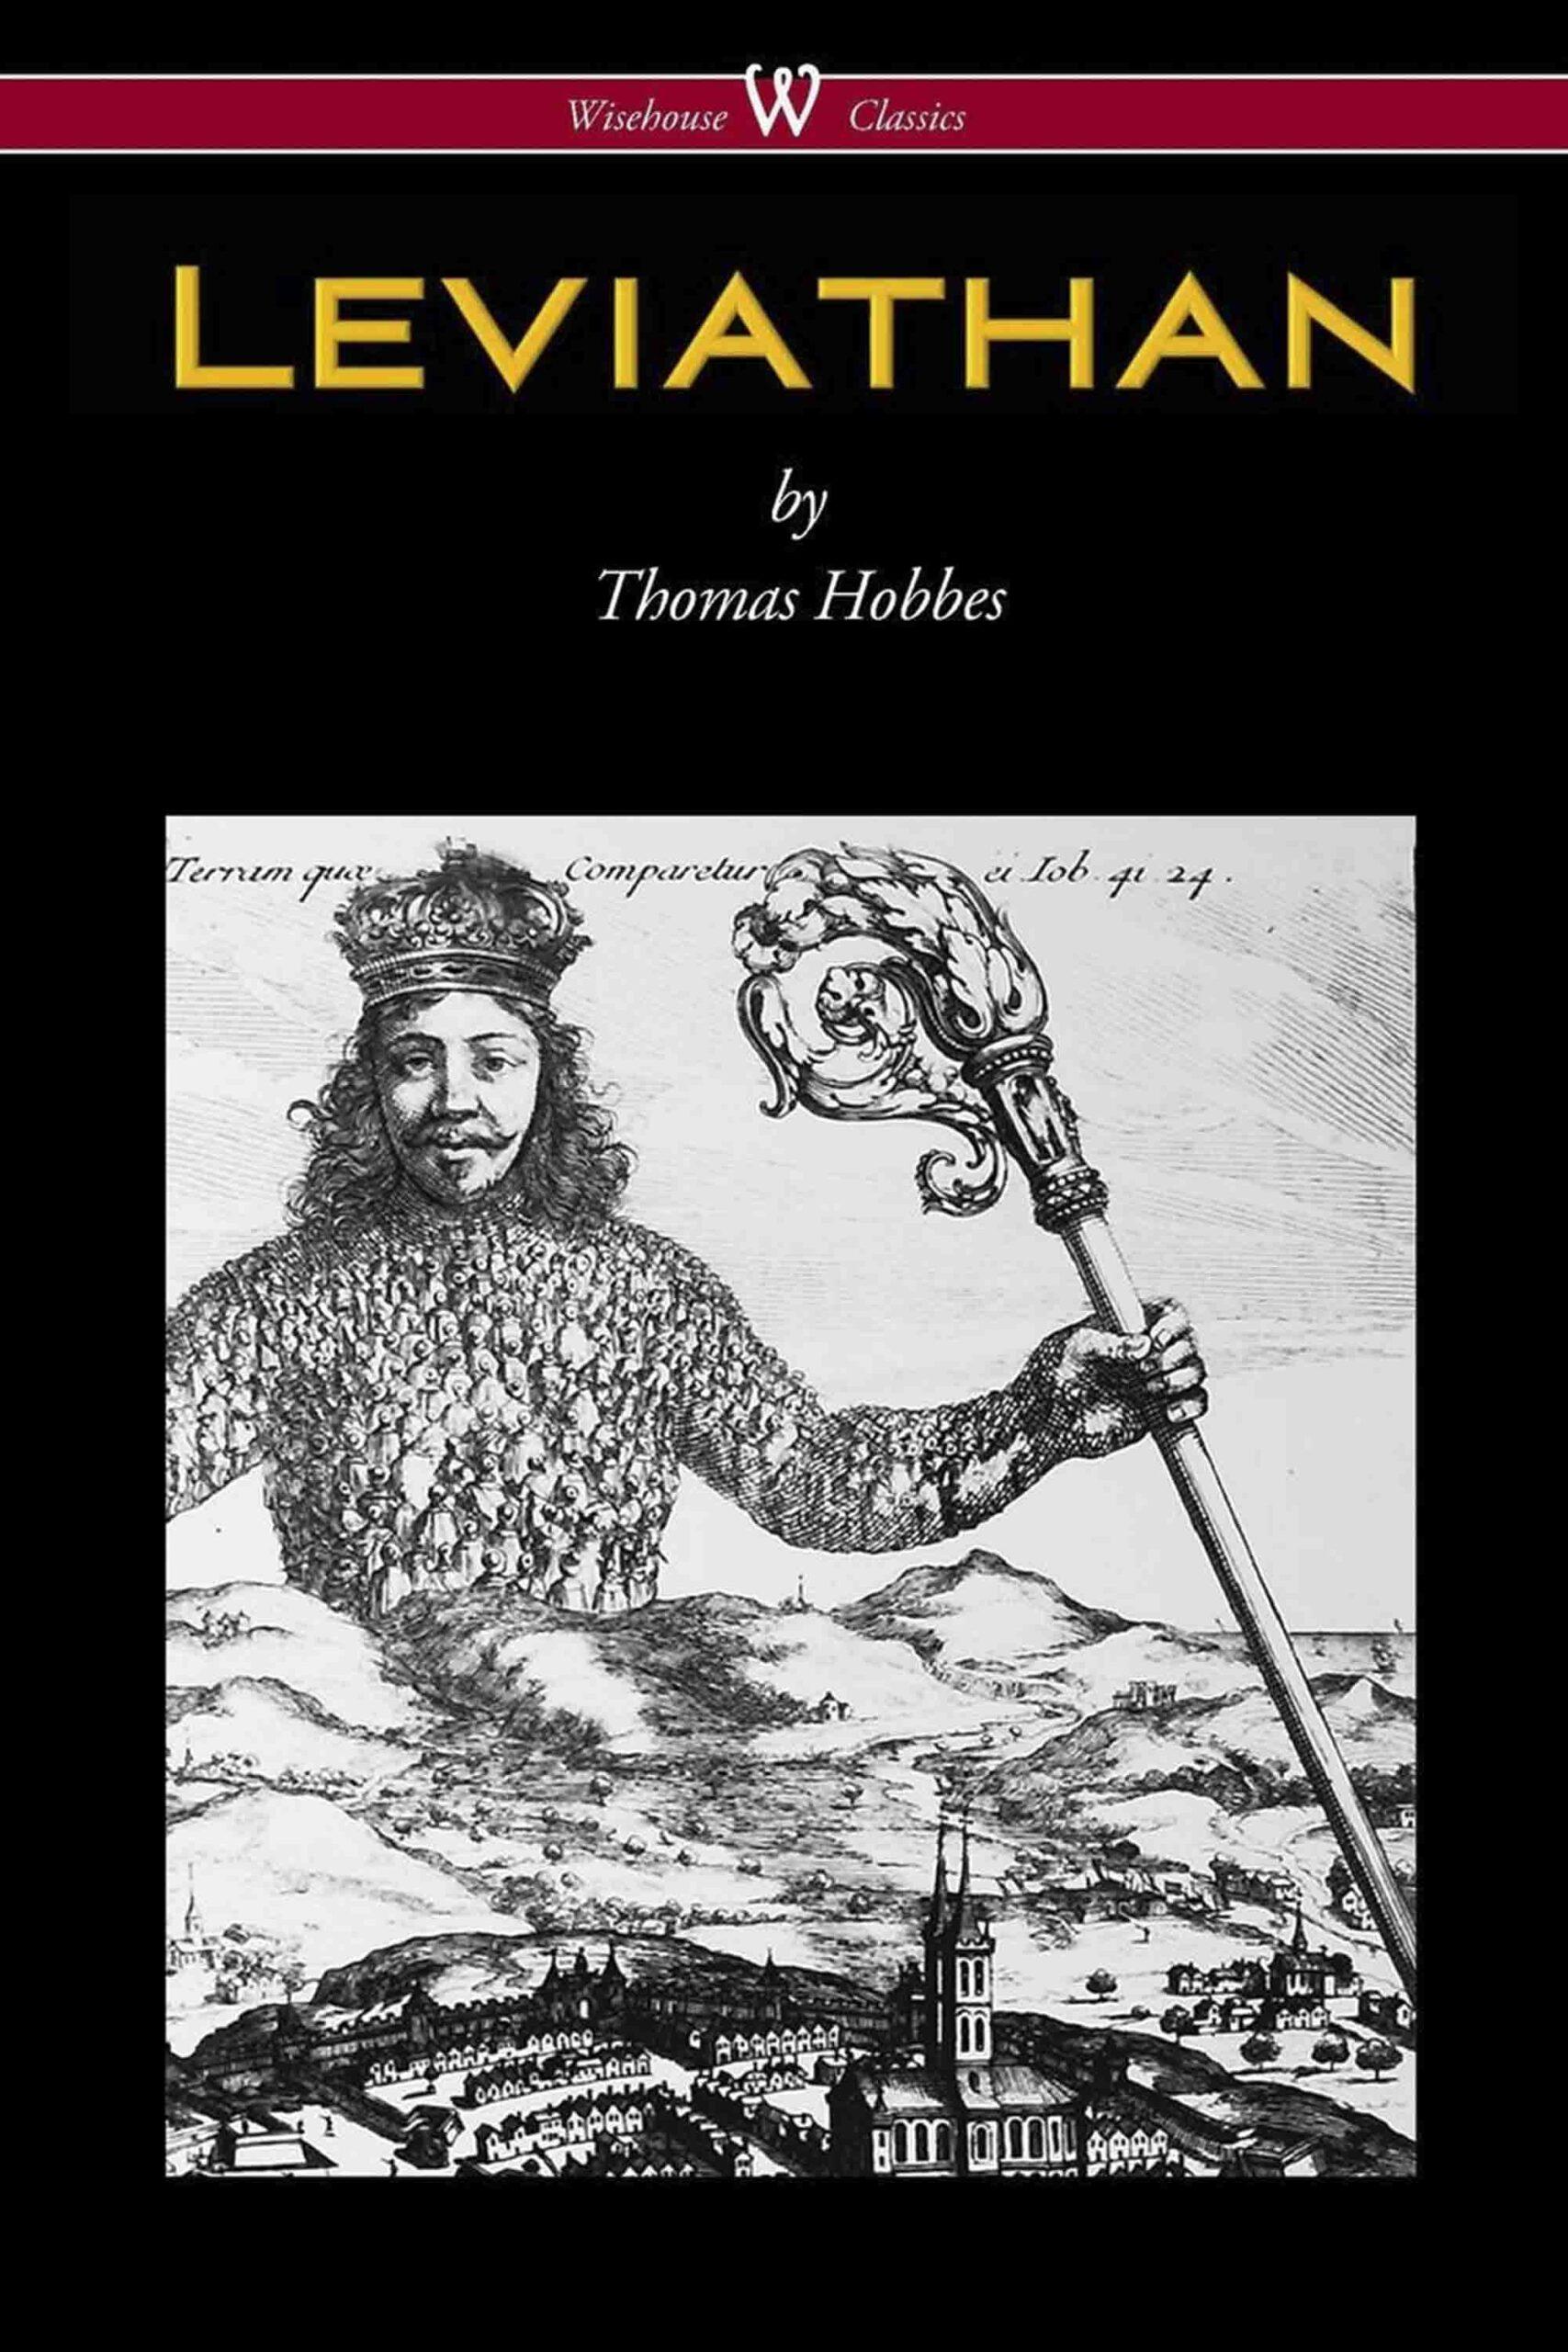 Leviathan (Wisehouse Classics – The Original Authoritative Edition)